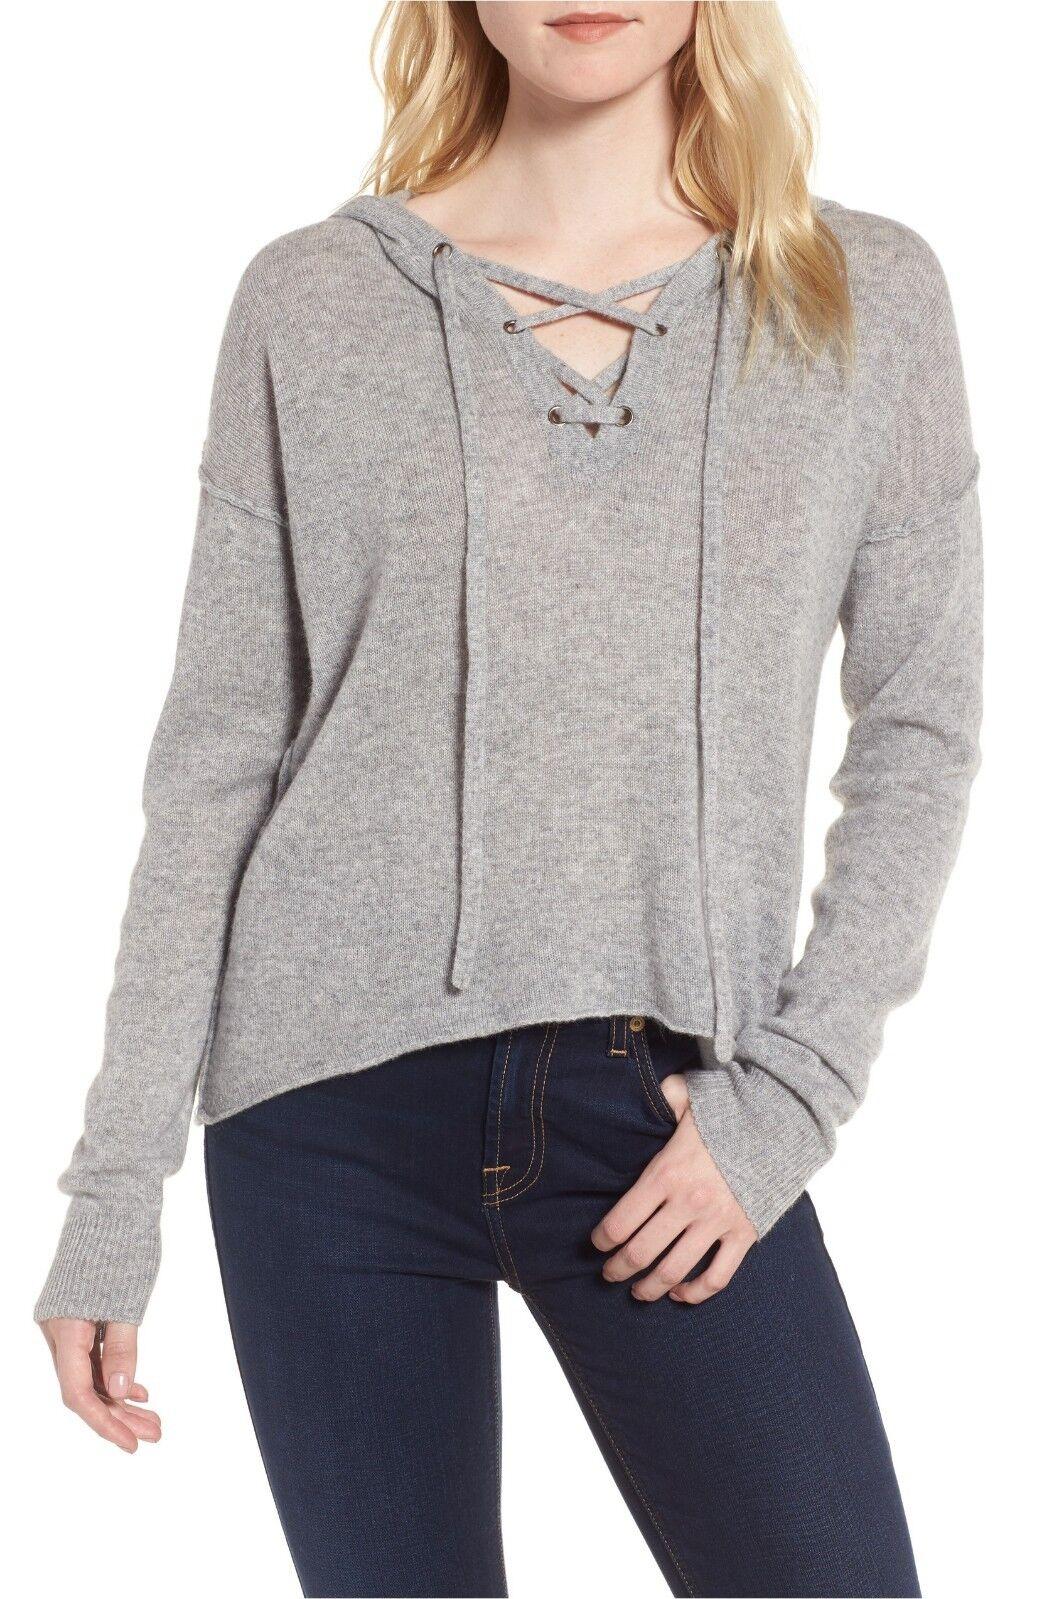 NWT Rails Dakota Lace-Up Cashmere Hooded Knit Sweater Heather Grey Size M  248